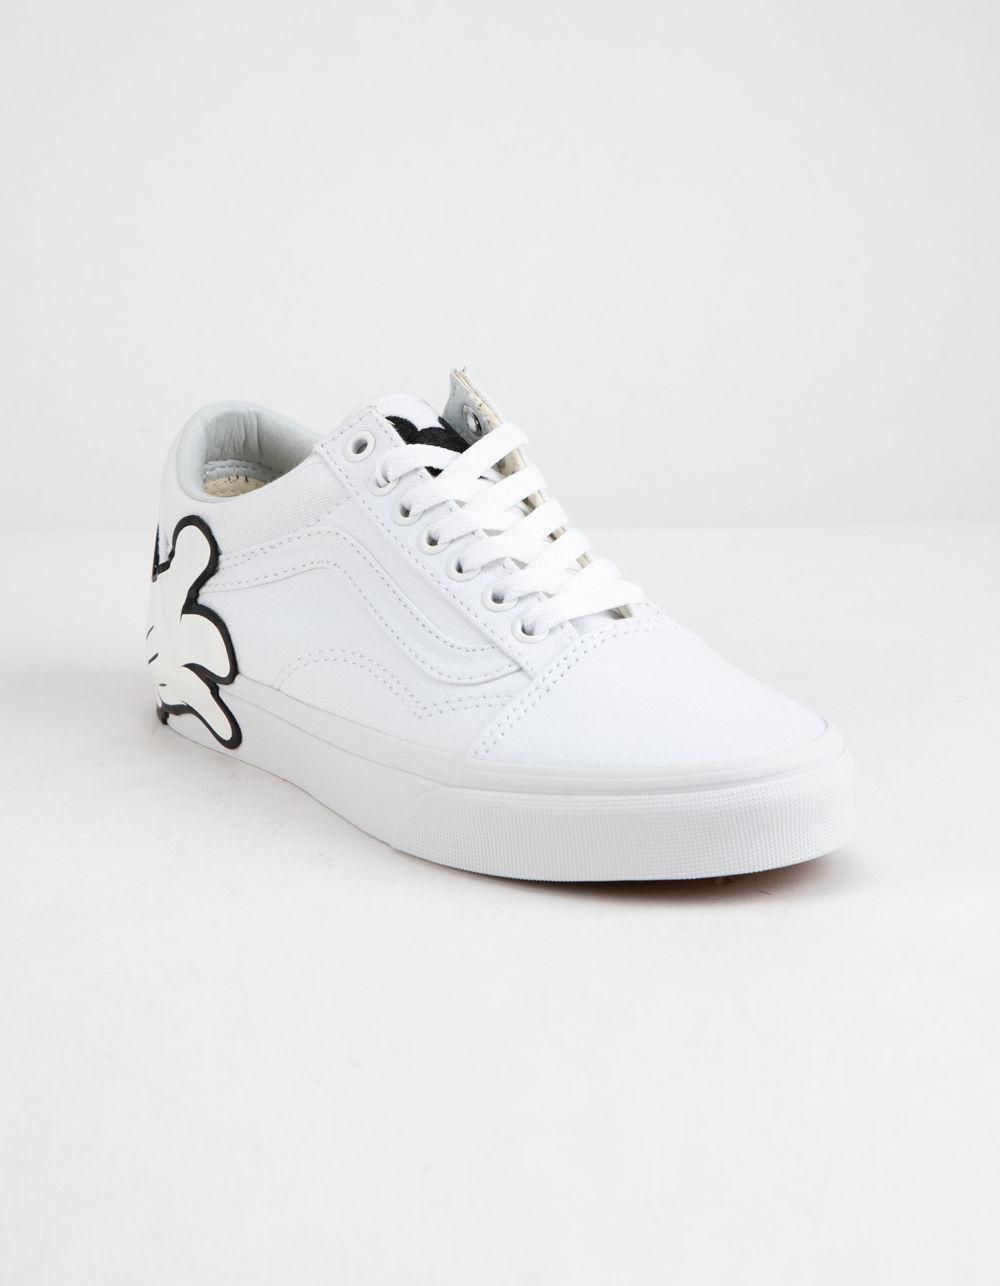 premium selection 170c1 6438b Women E Skool Lyst True Sneakers 90 Mickeys Disney Vans Au Old wIF5PFq8